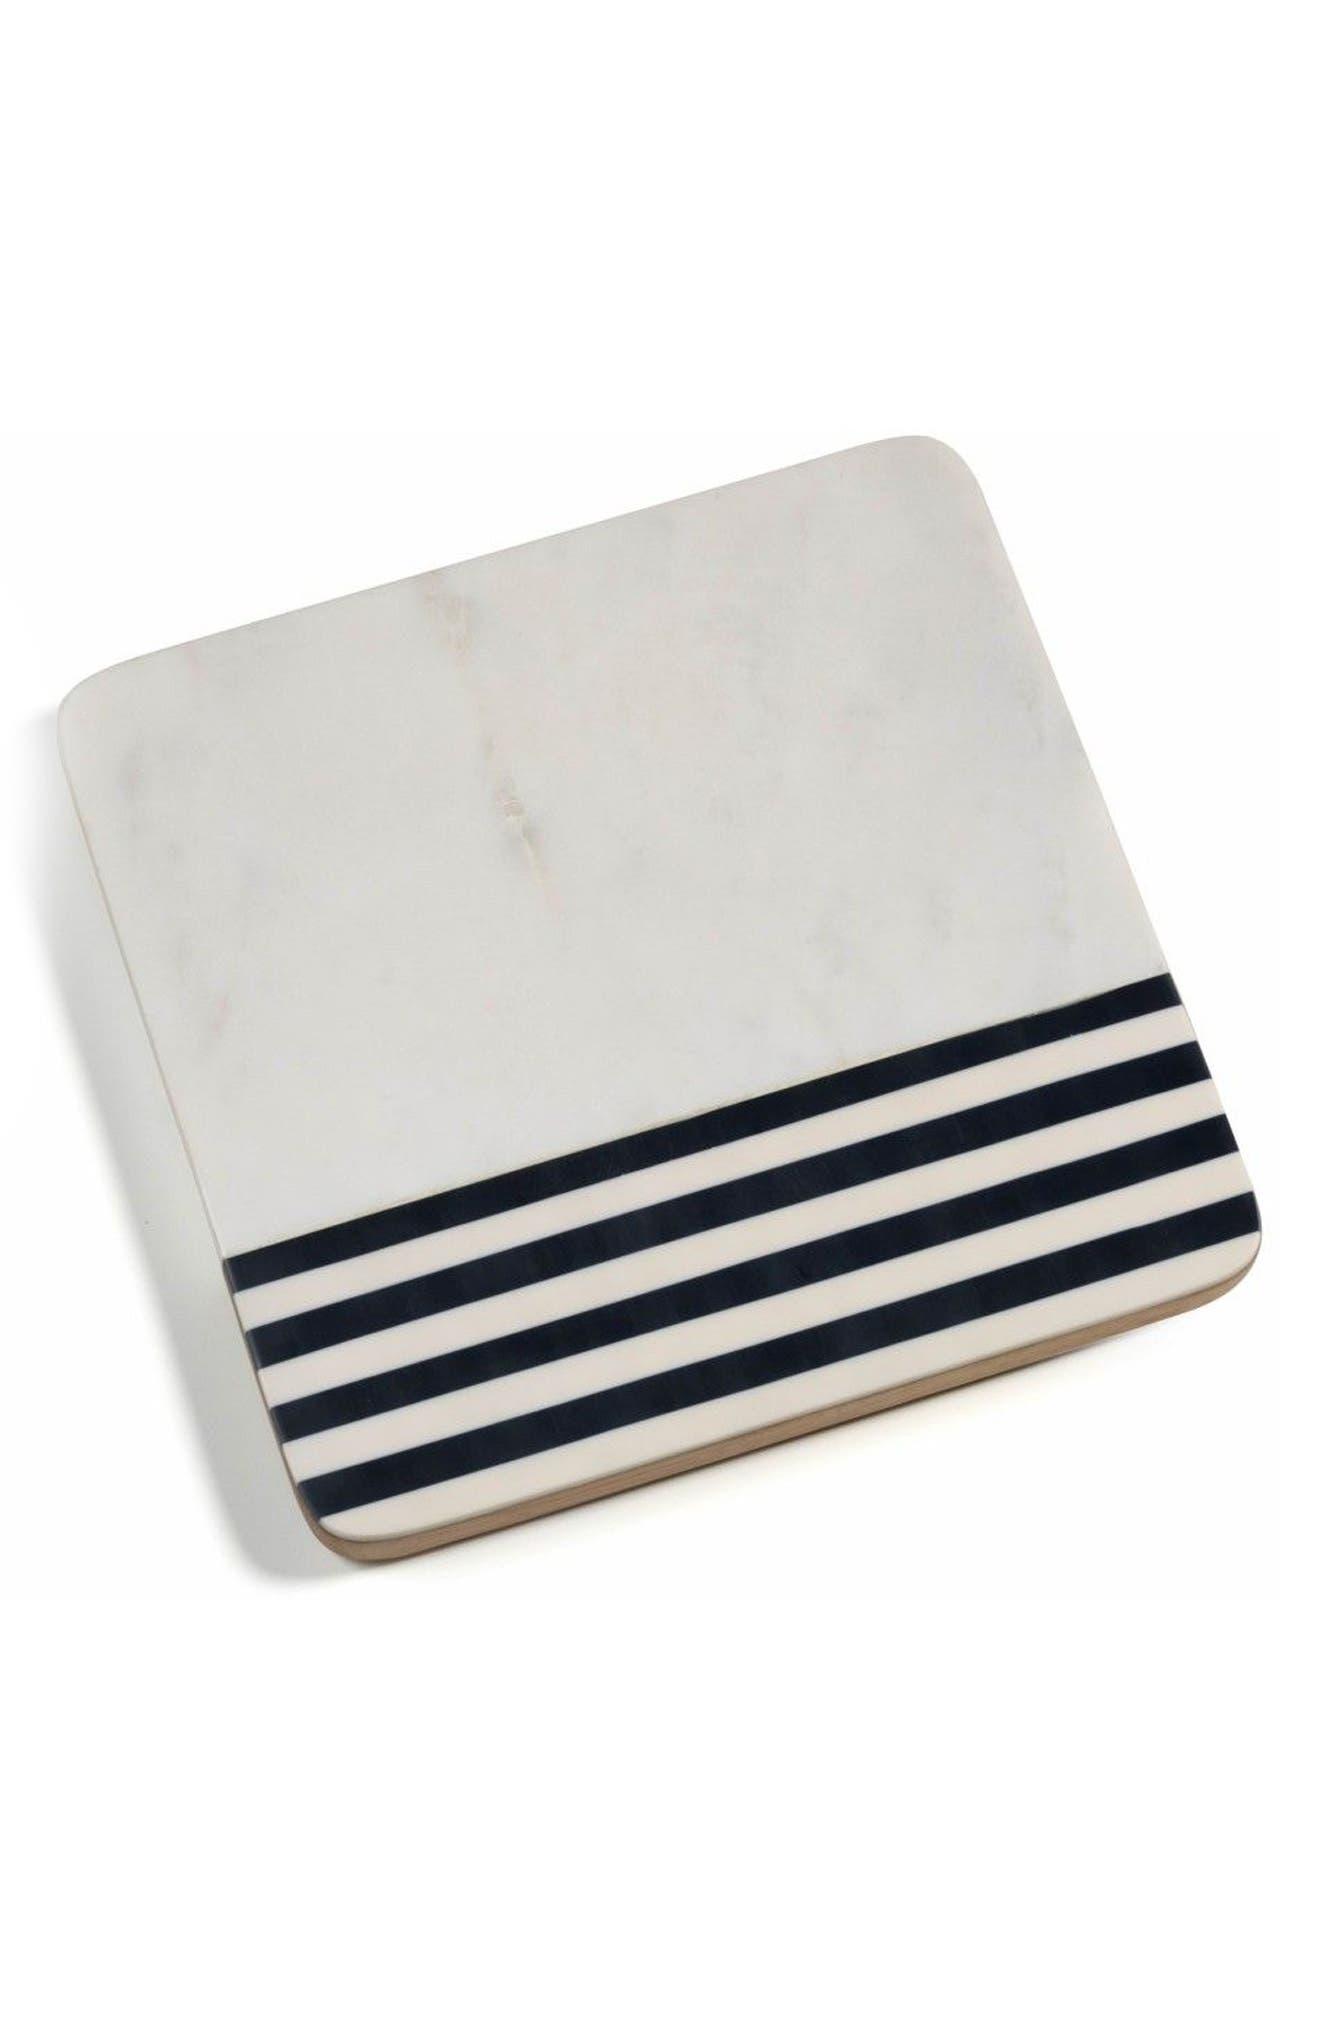 Main Image - Zodax Marine Marble & Wood Cheese Board